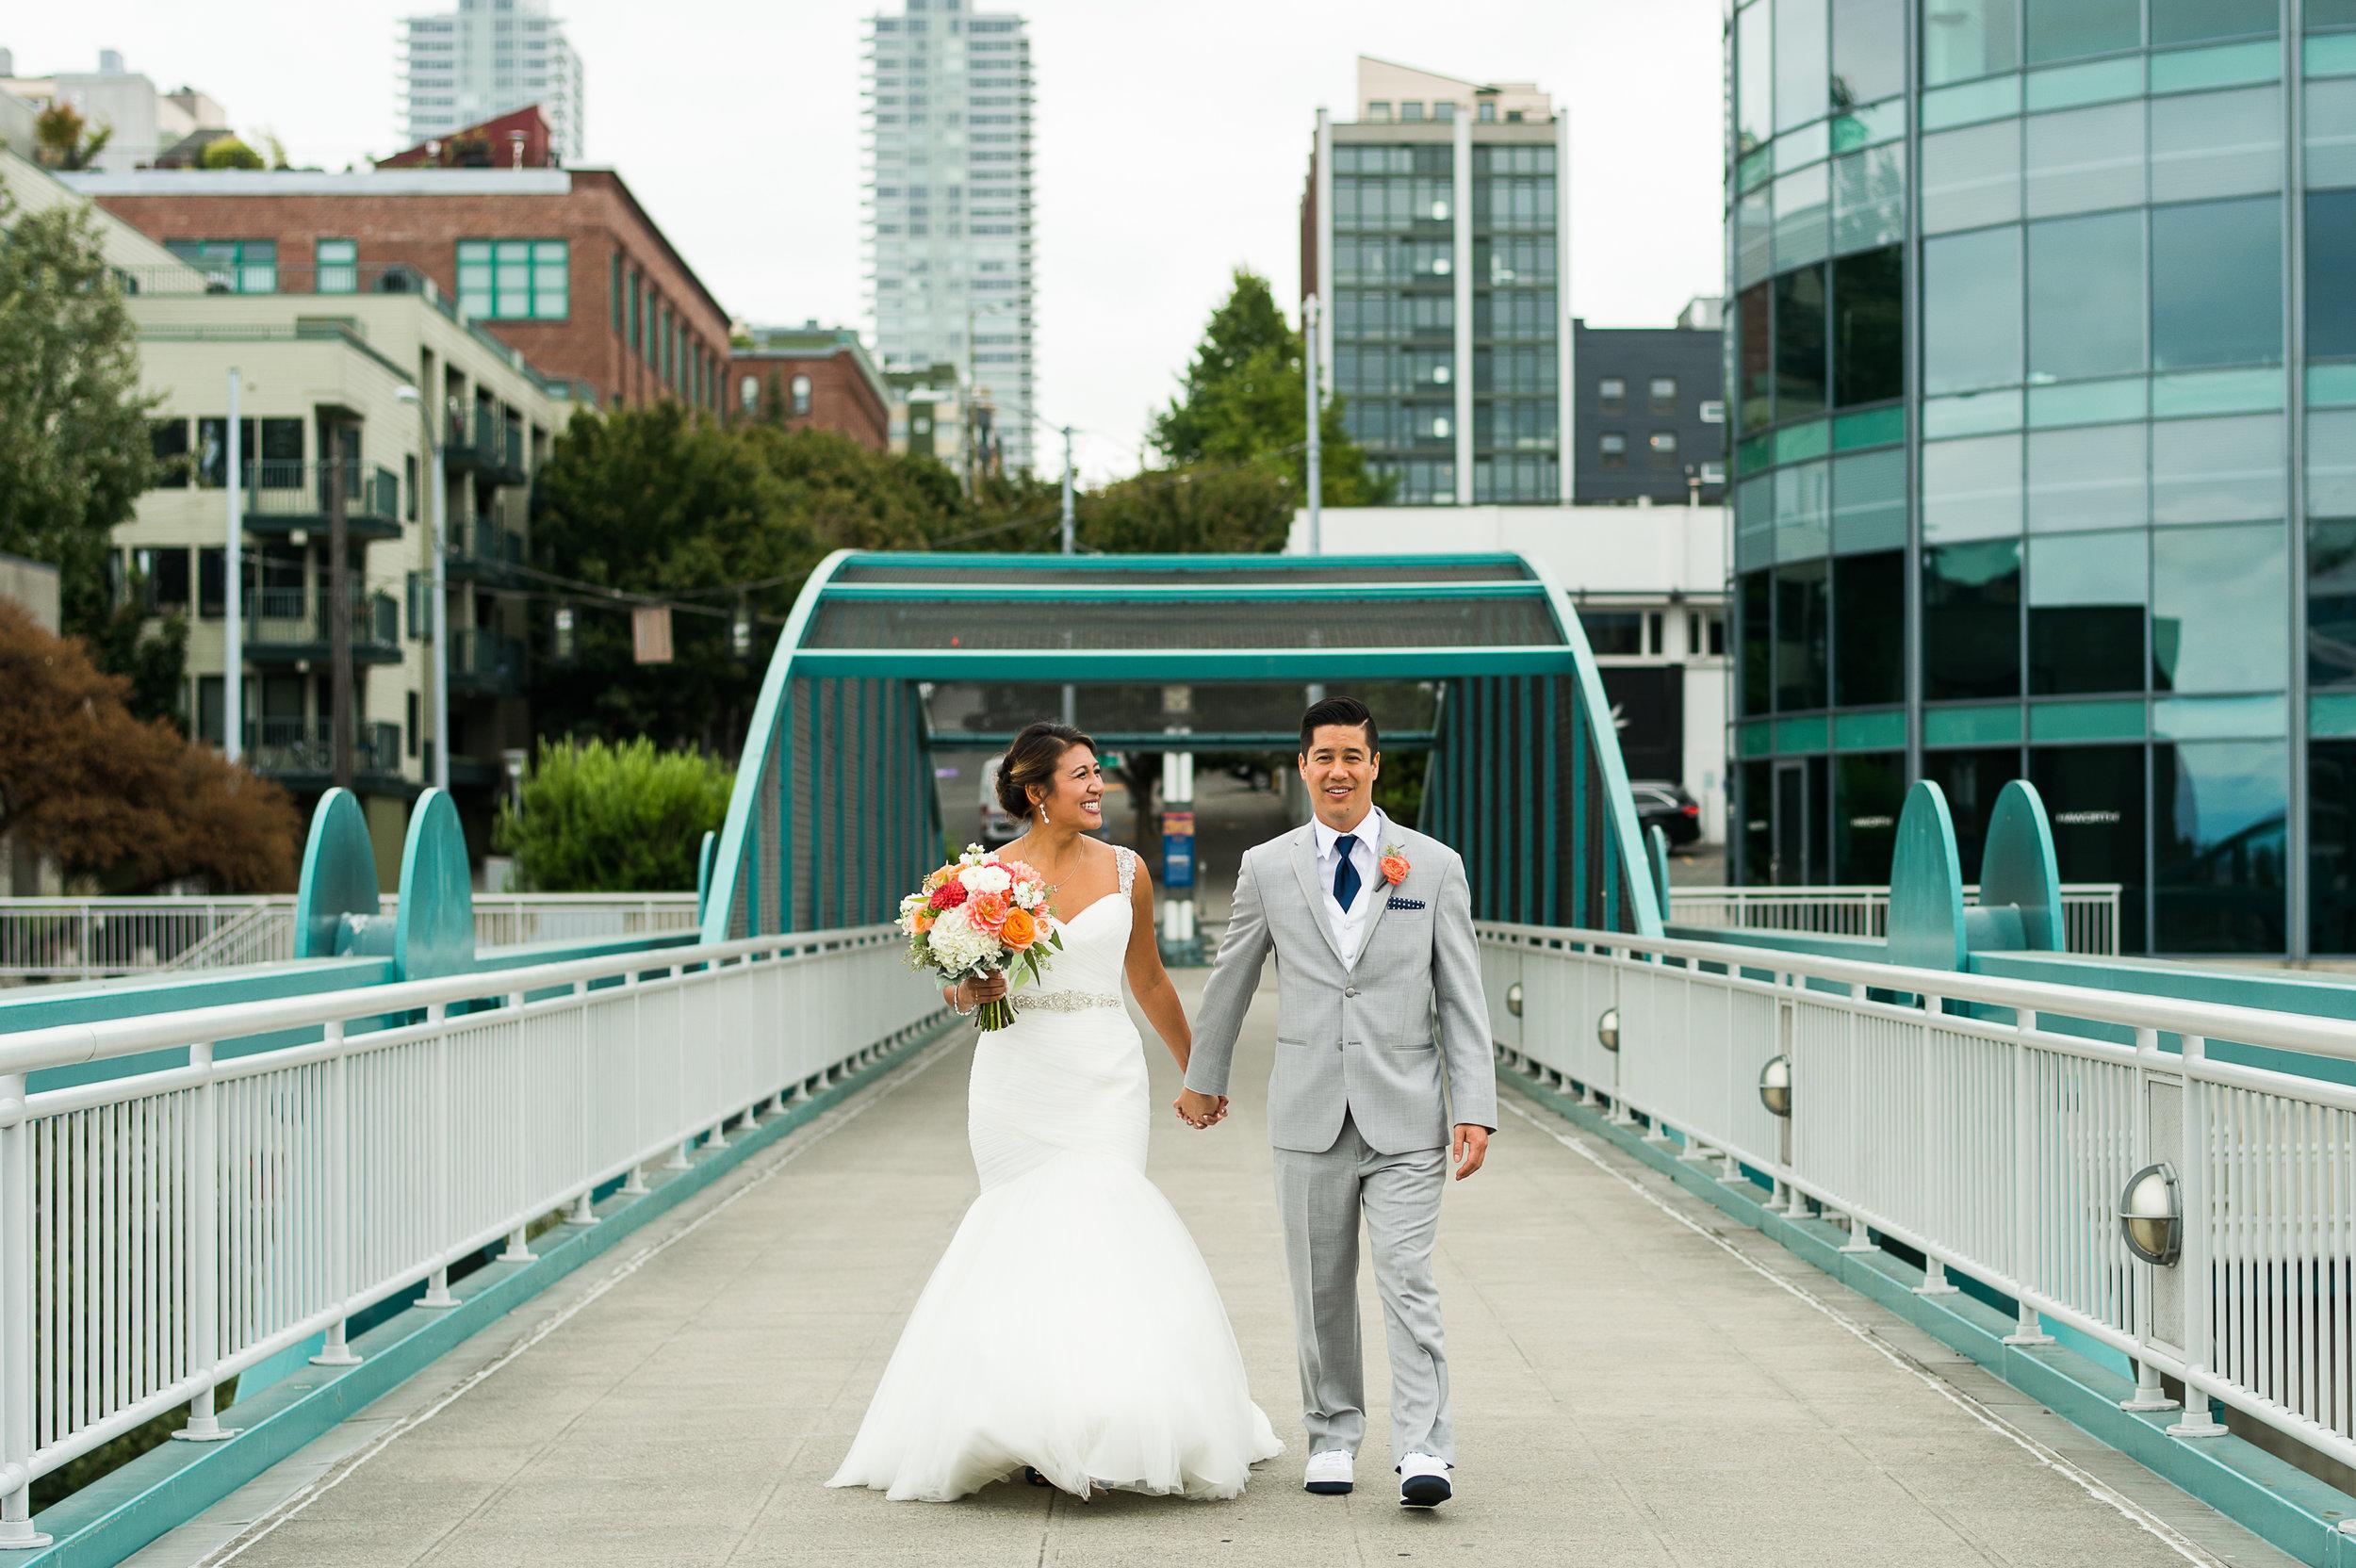 DJ-wedding-Van-Wyhe-Photography-121.jpg